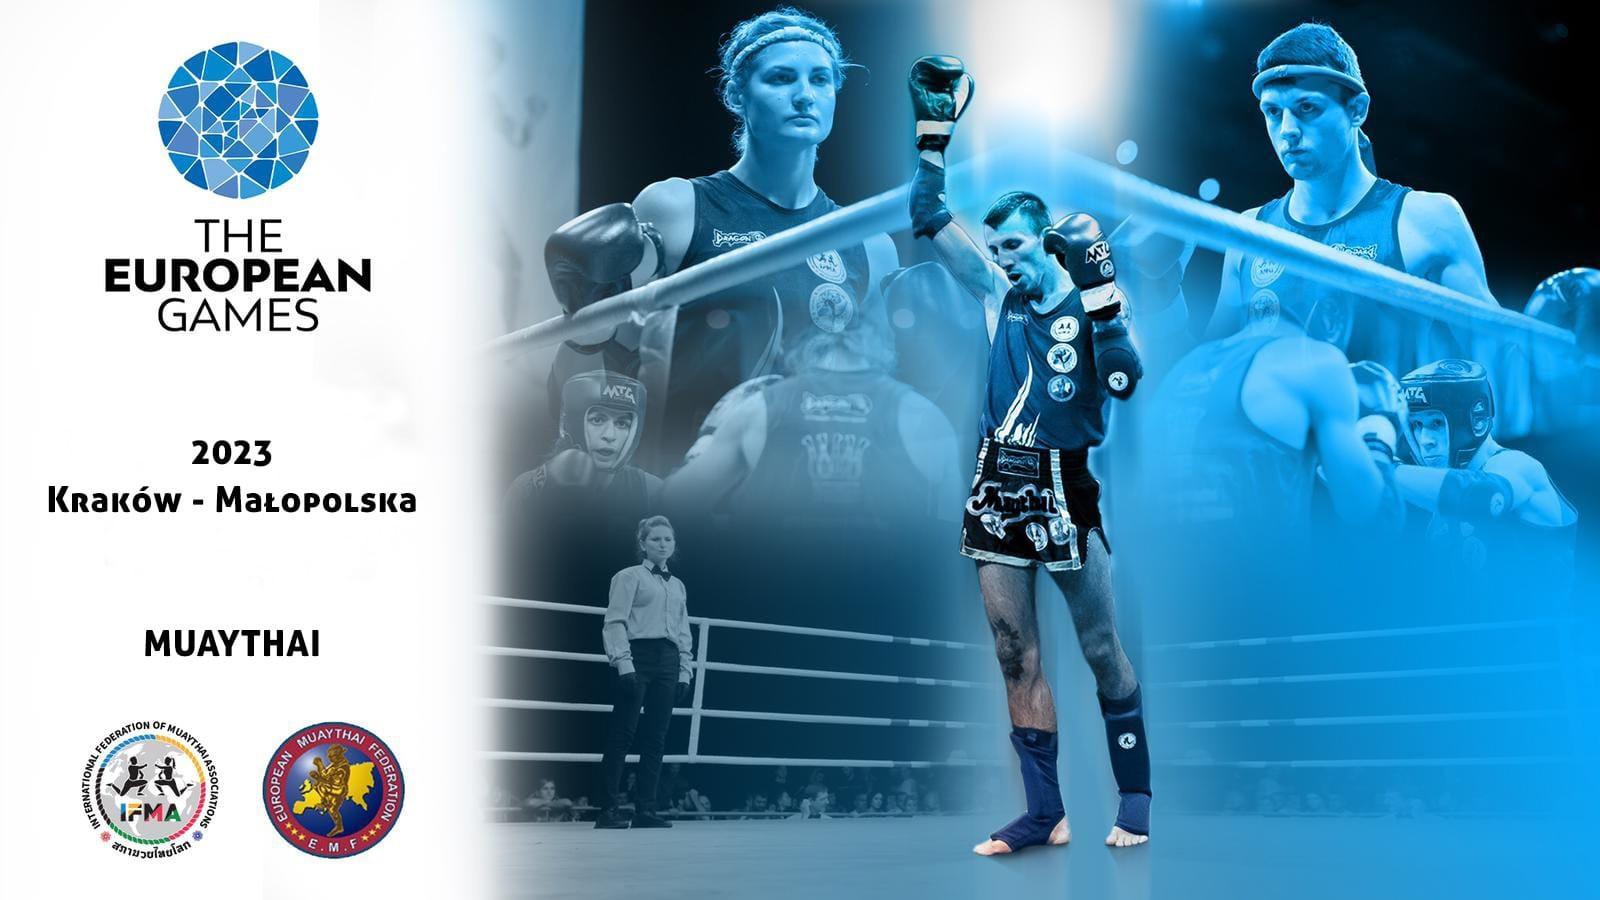 Muaythai to make European Games debut at Kraków-Małopolska 2023